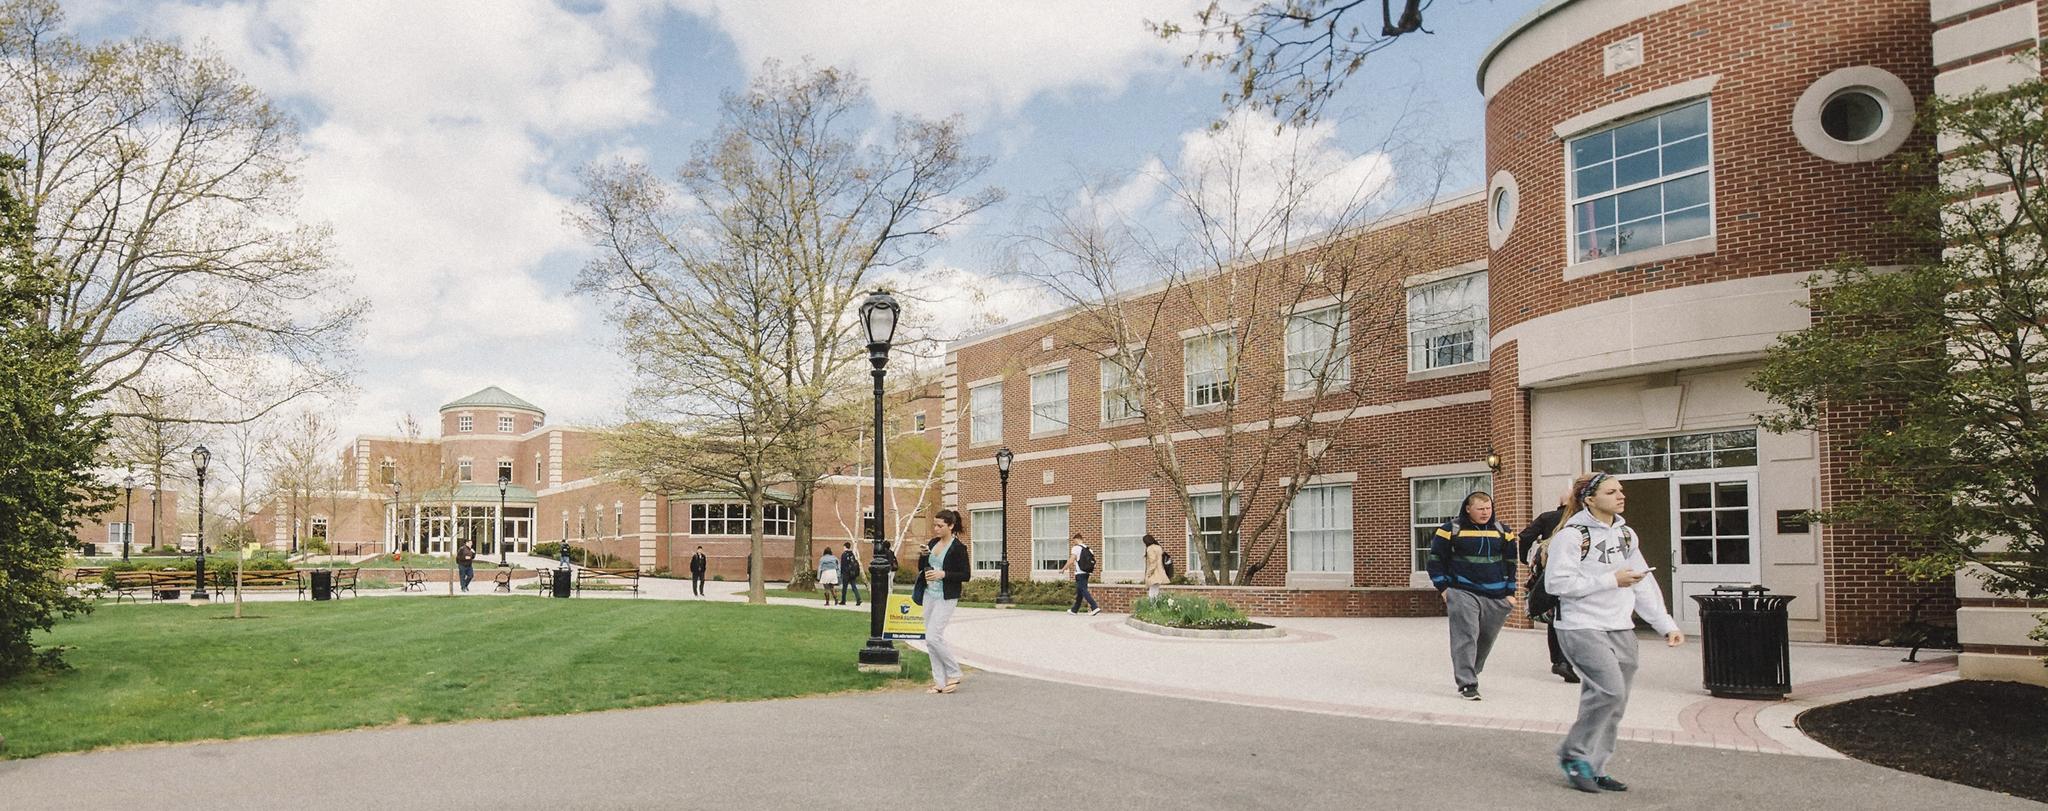 Fairleigh Dickinson University Winter Break | Printable Regarding Metro Nashville Public School 2021 Calendar